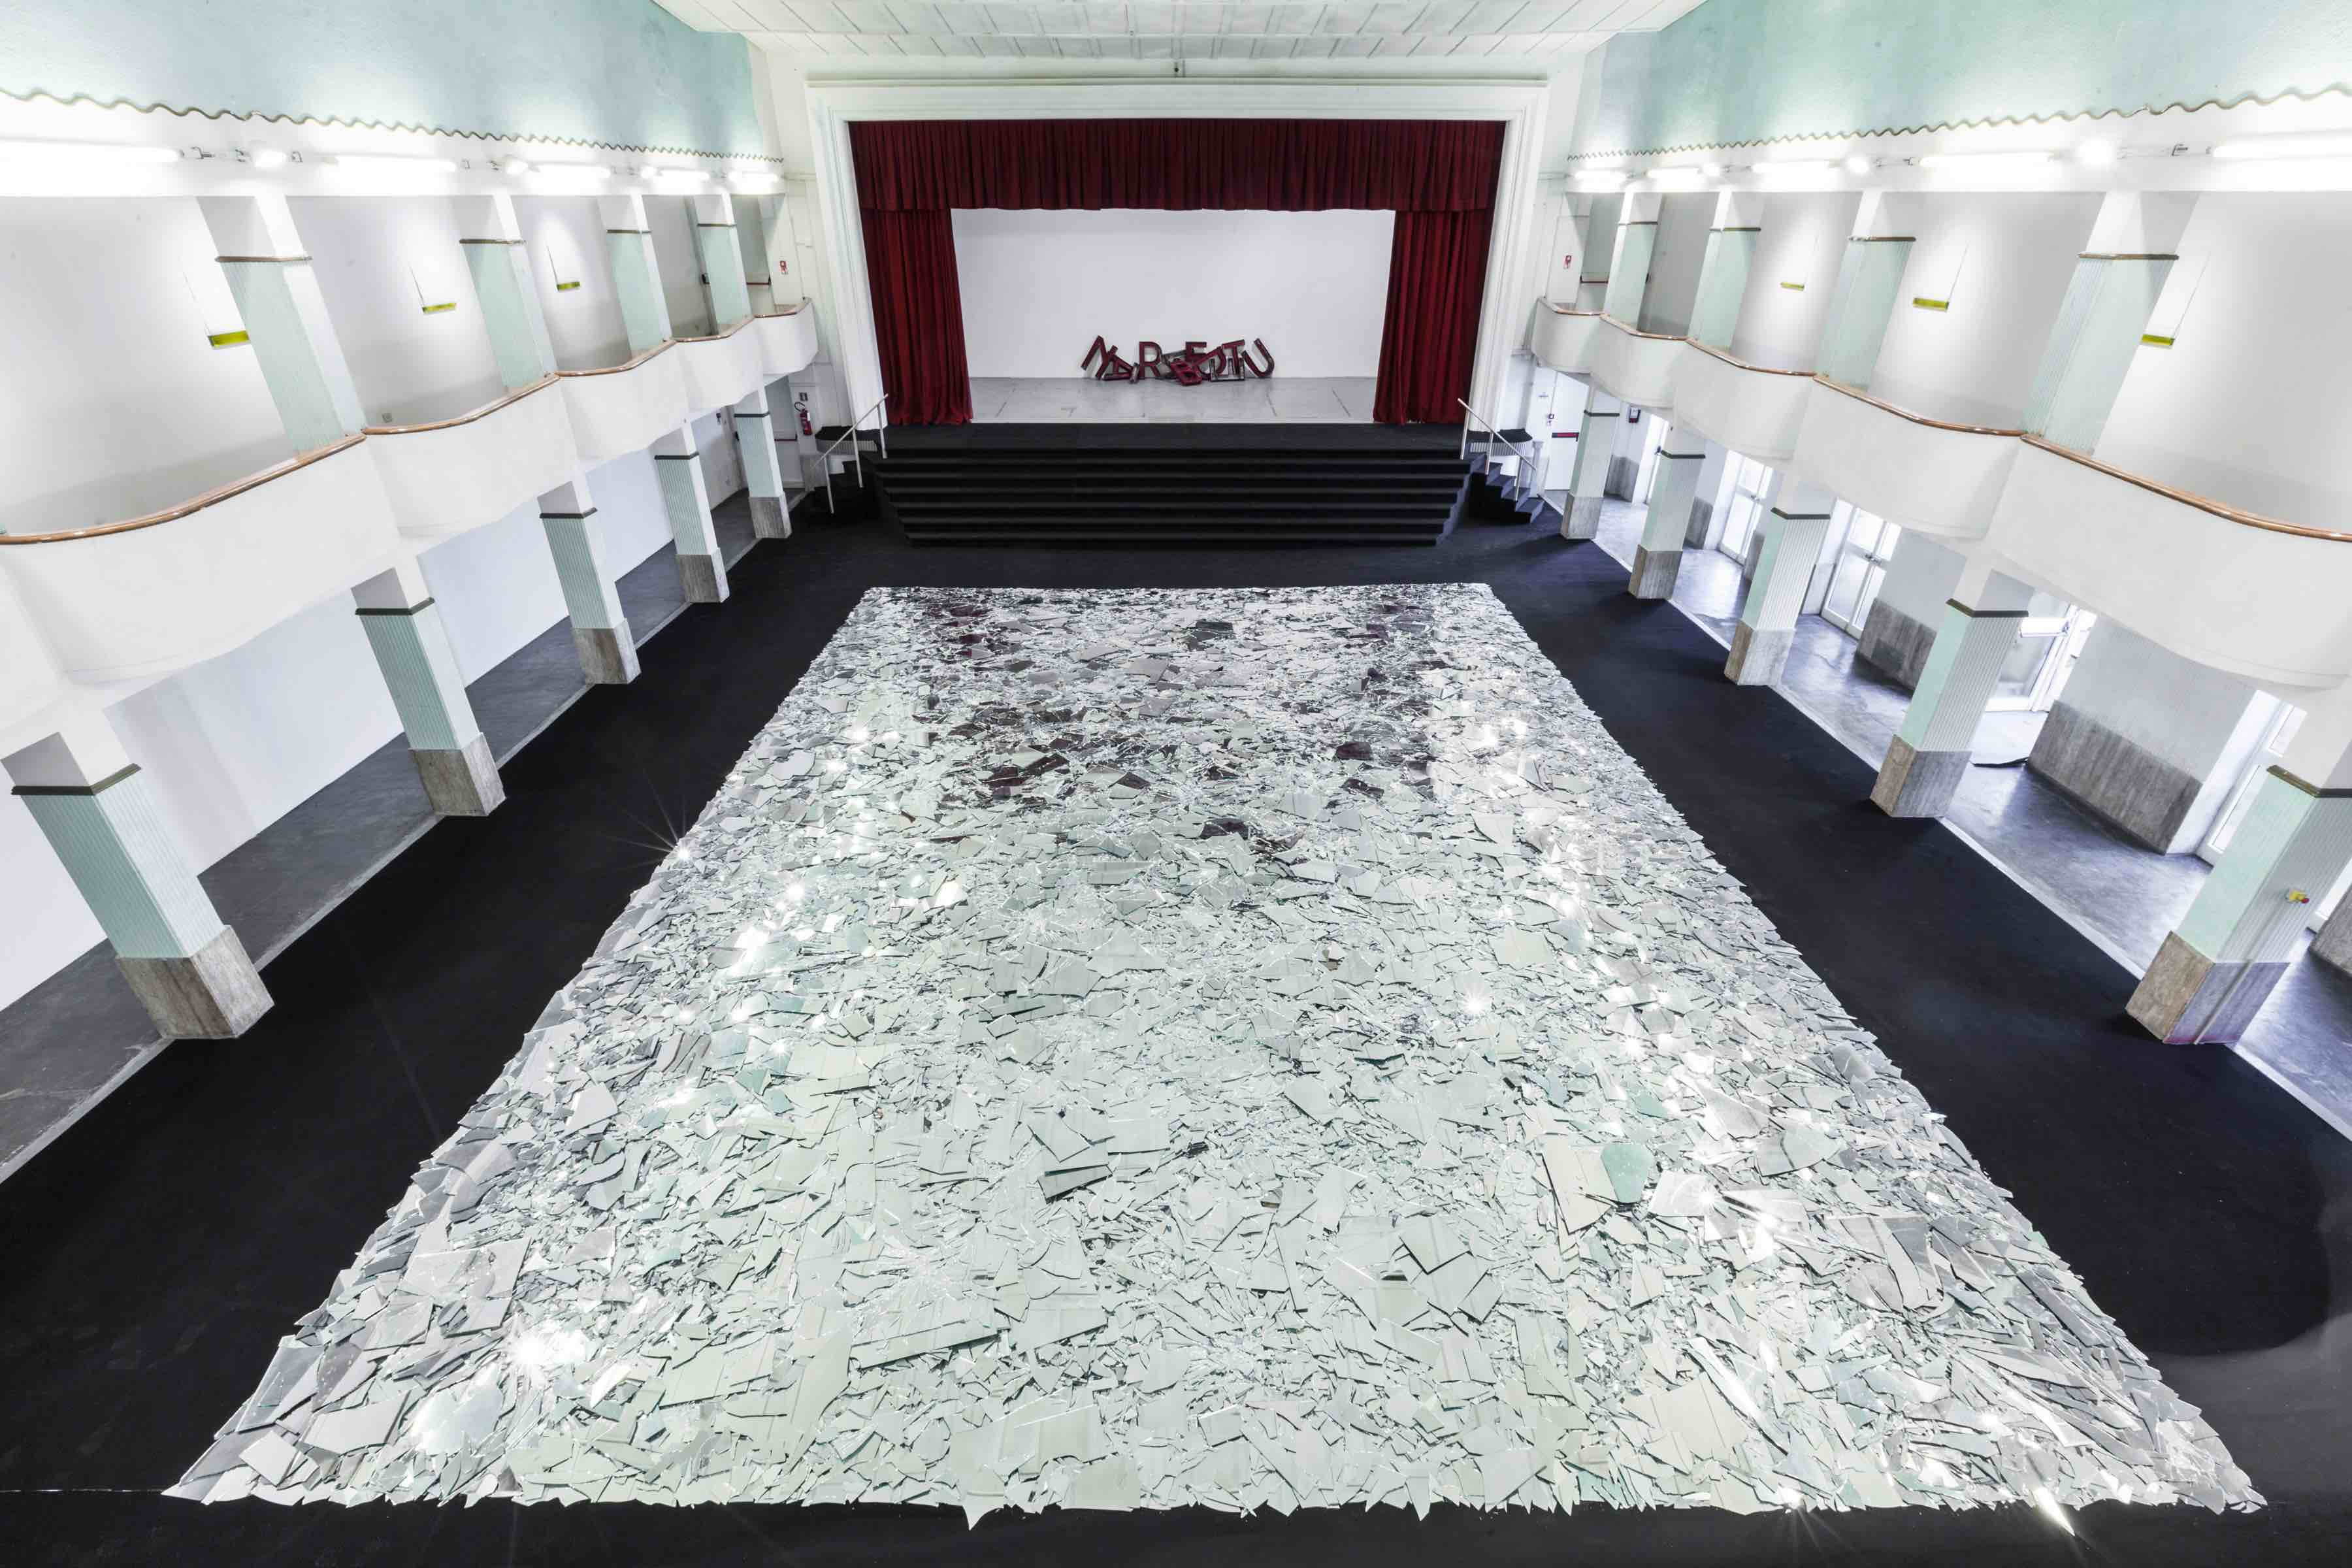 Kader Attia, Le grand miroir du monde, 2017. Courtesy the artist & Galleria Continua, San Gimignano, Beijing, Les Moulins, Habana